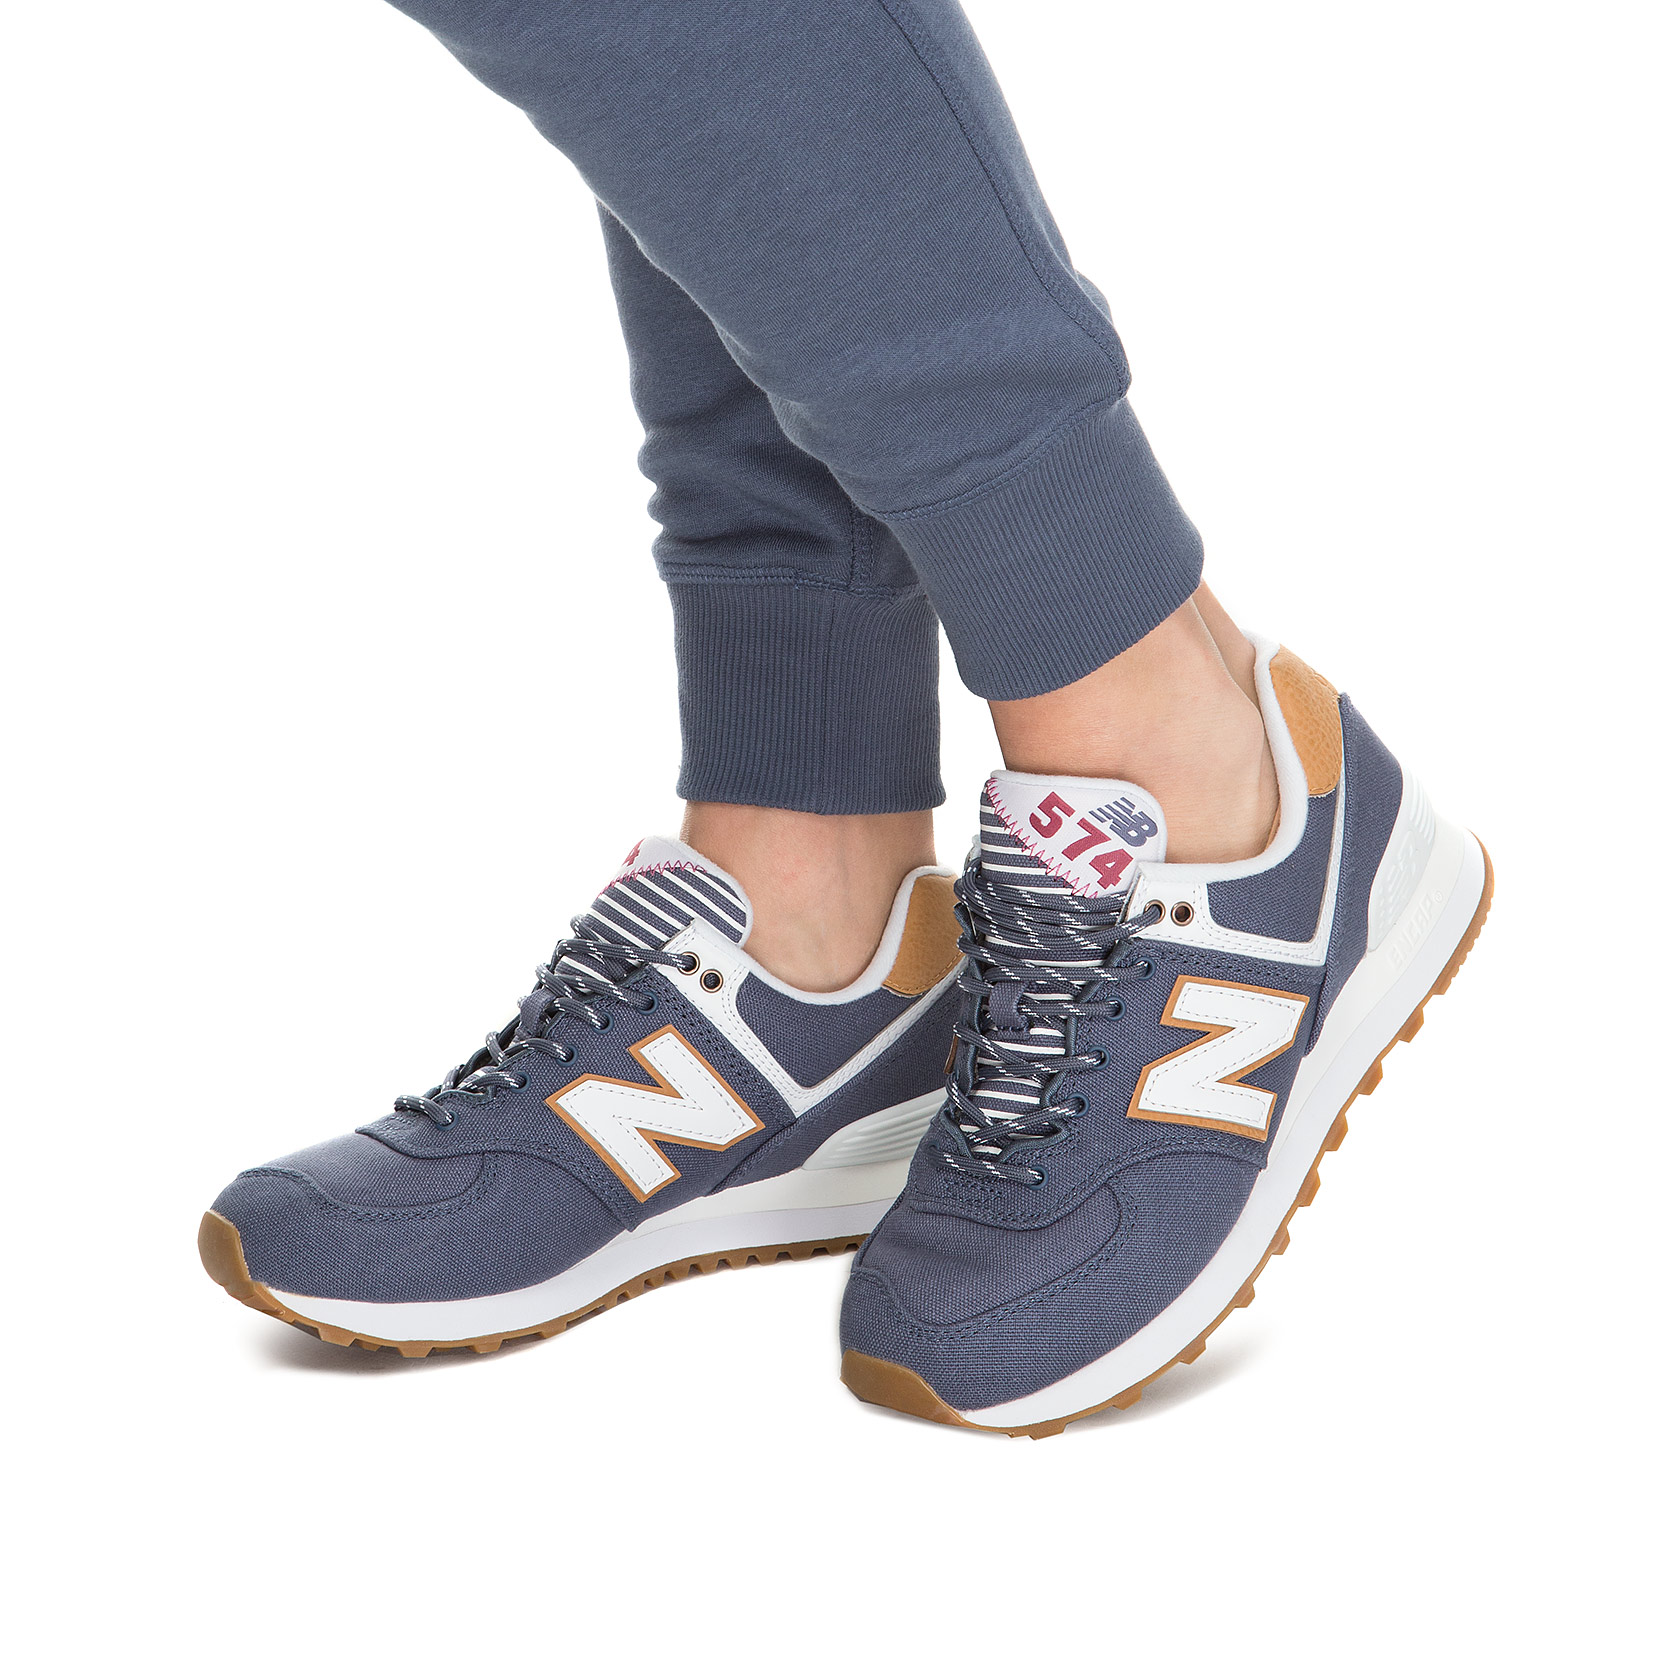 Жіноче взуття повсякденне New Balance 574 Canvas WL574SYD | New Balance